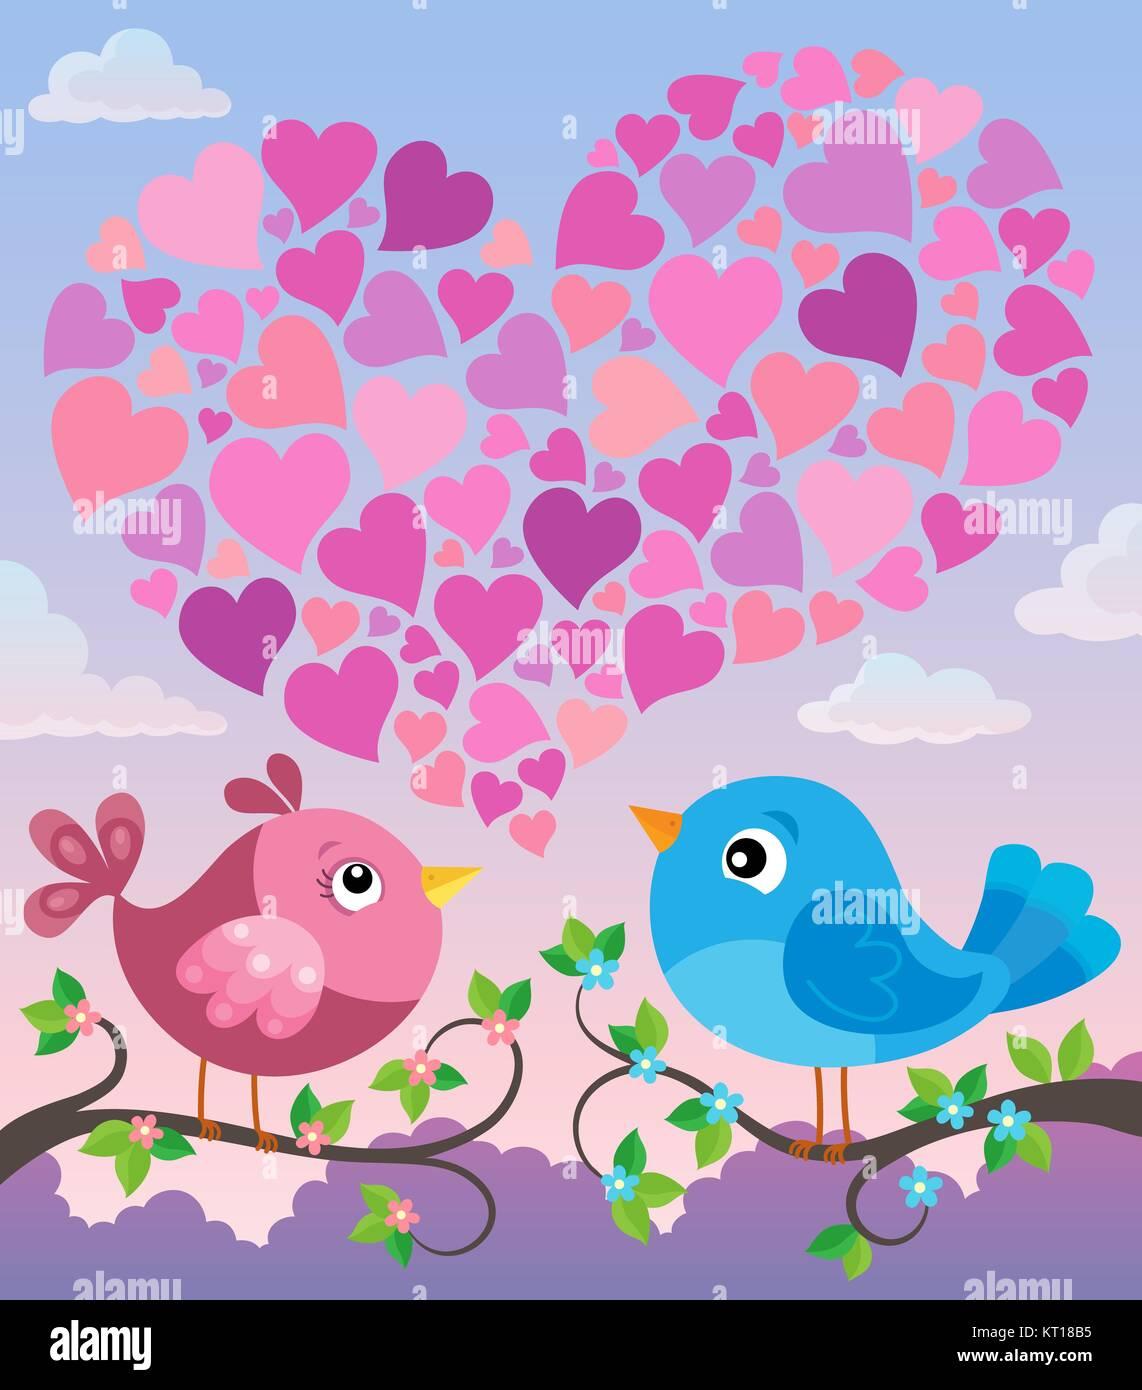 Valentine birds with heart shape theme 2 - Stock Image